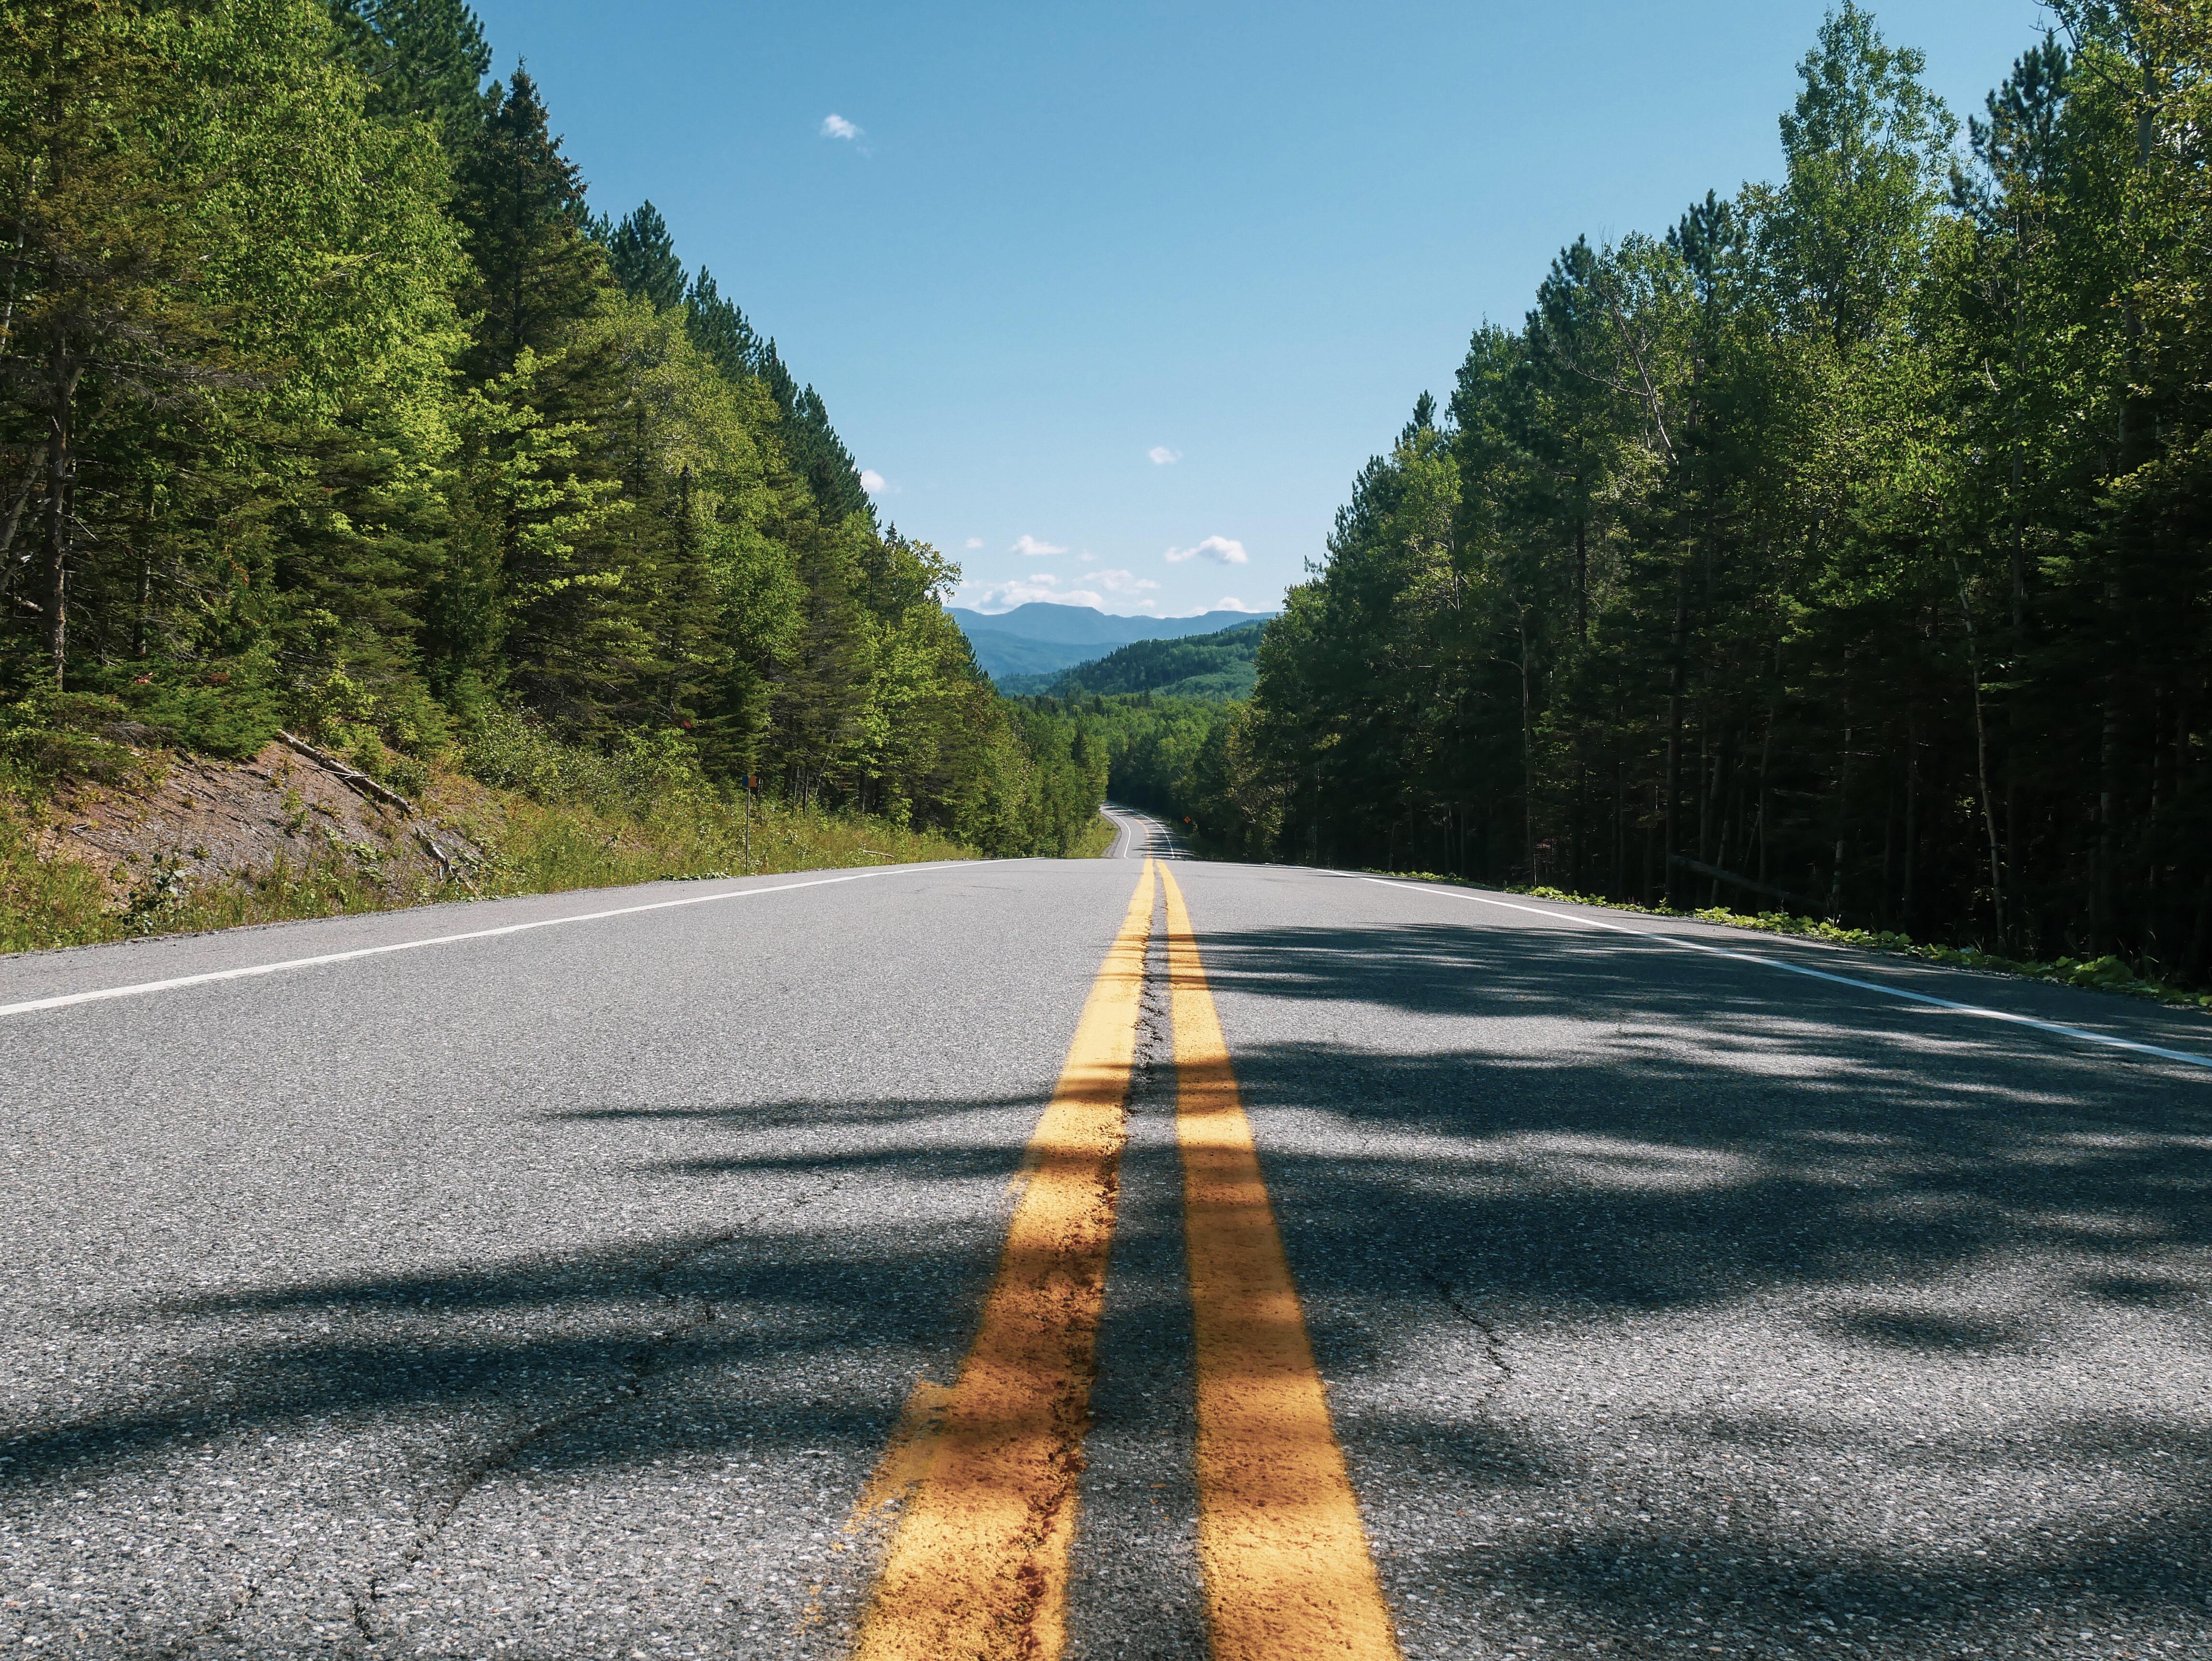 Route du Québec - Roadtrip au Québec, Canada - Blog Voyage Ma Folie Vagabonde